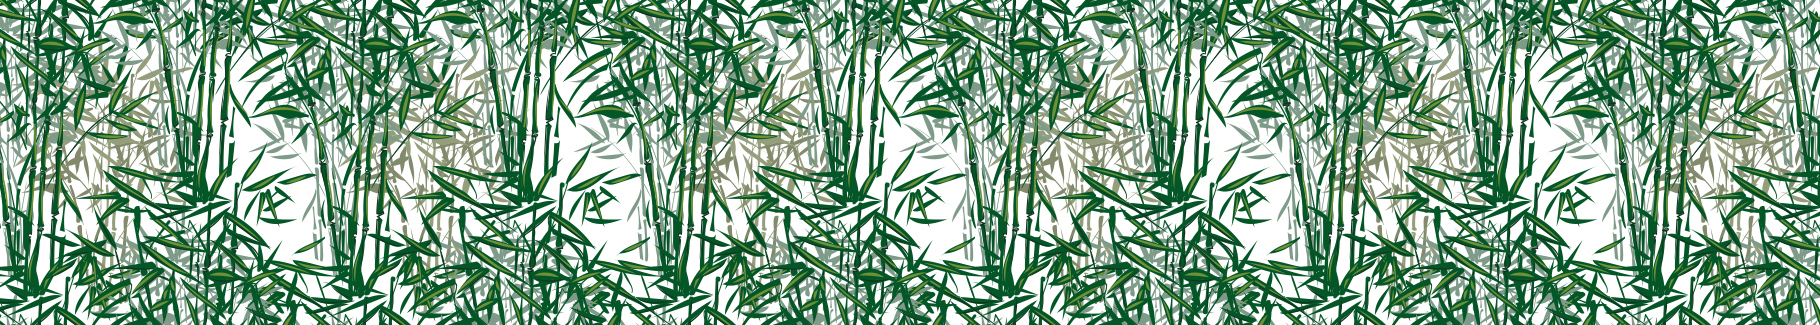 Fototapeta bambusowe pnie